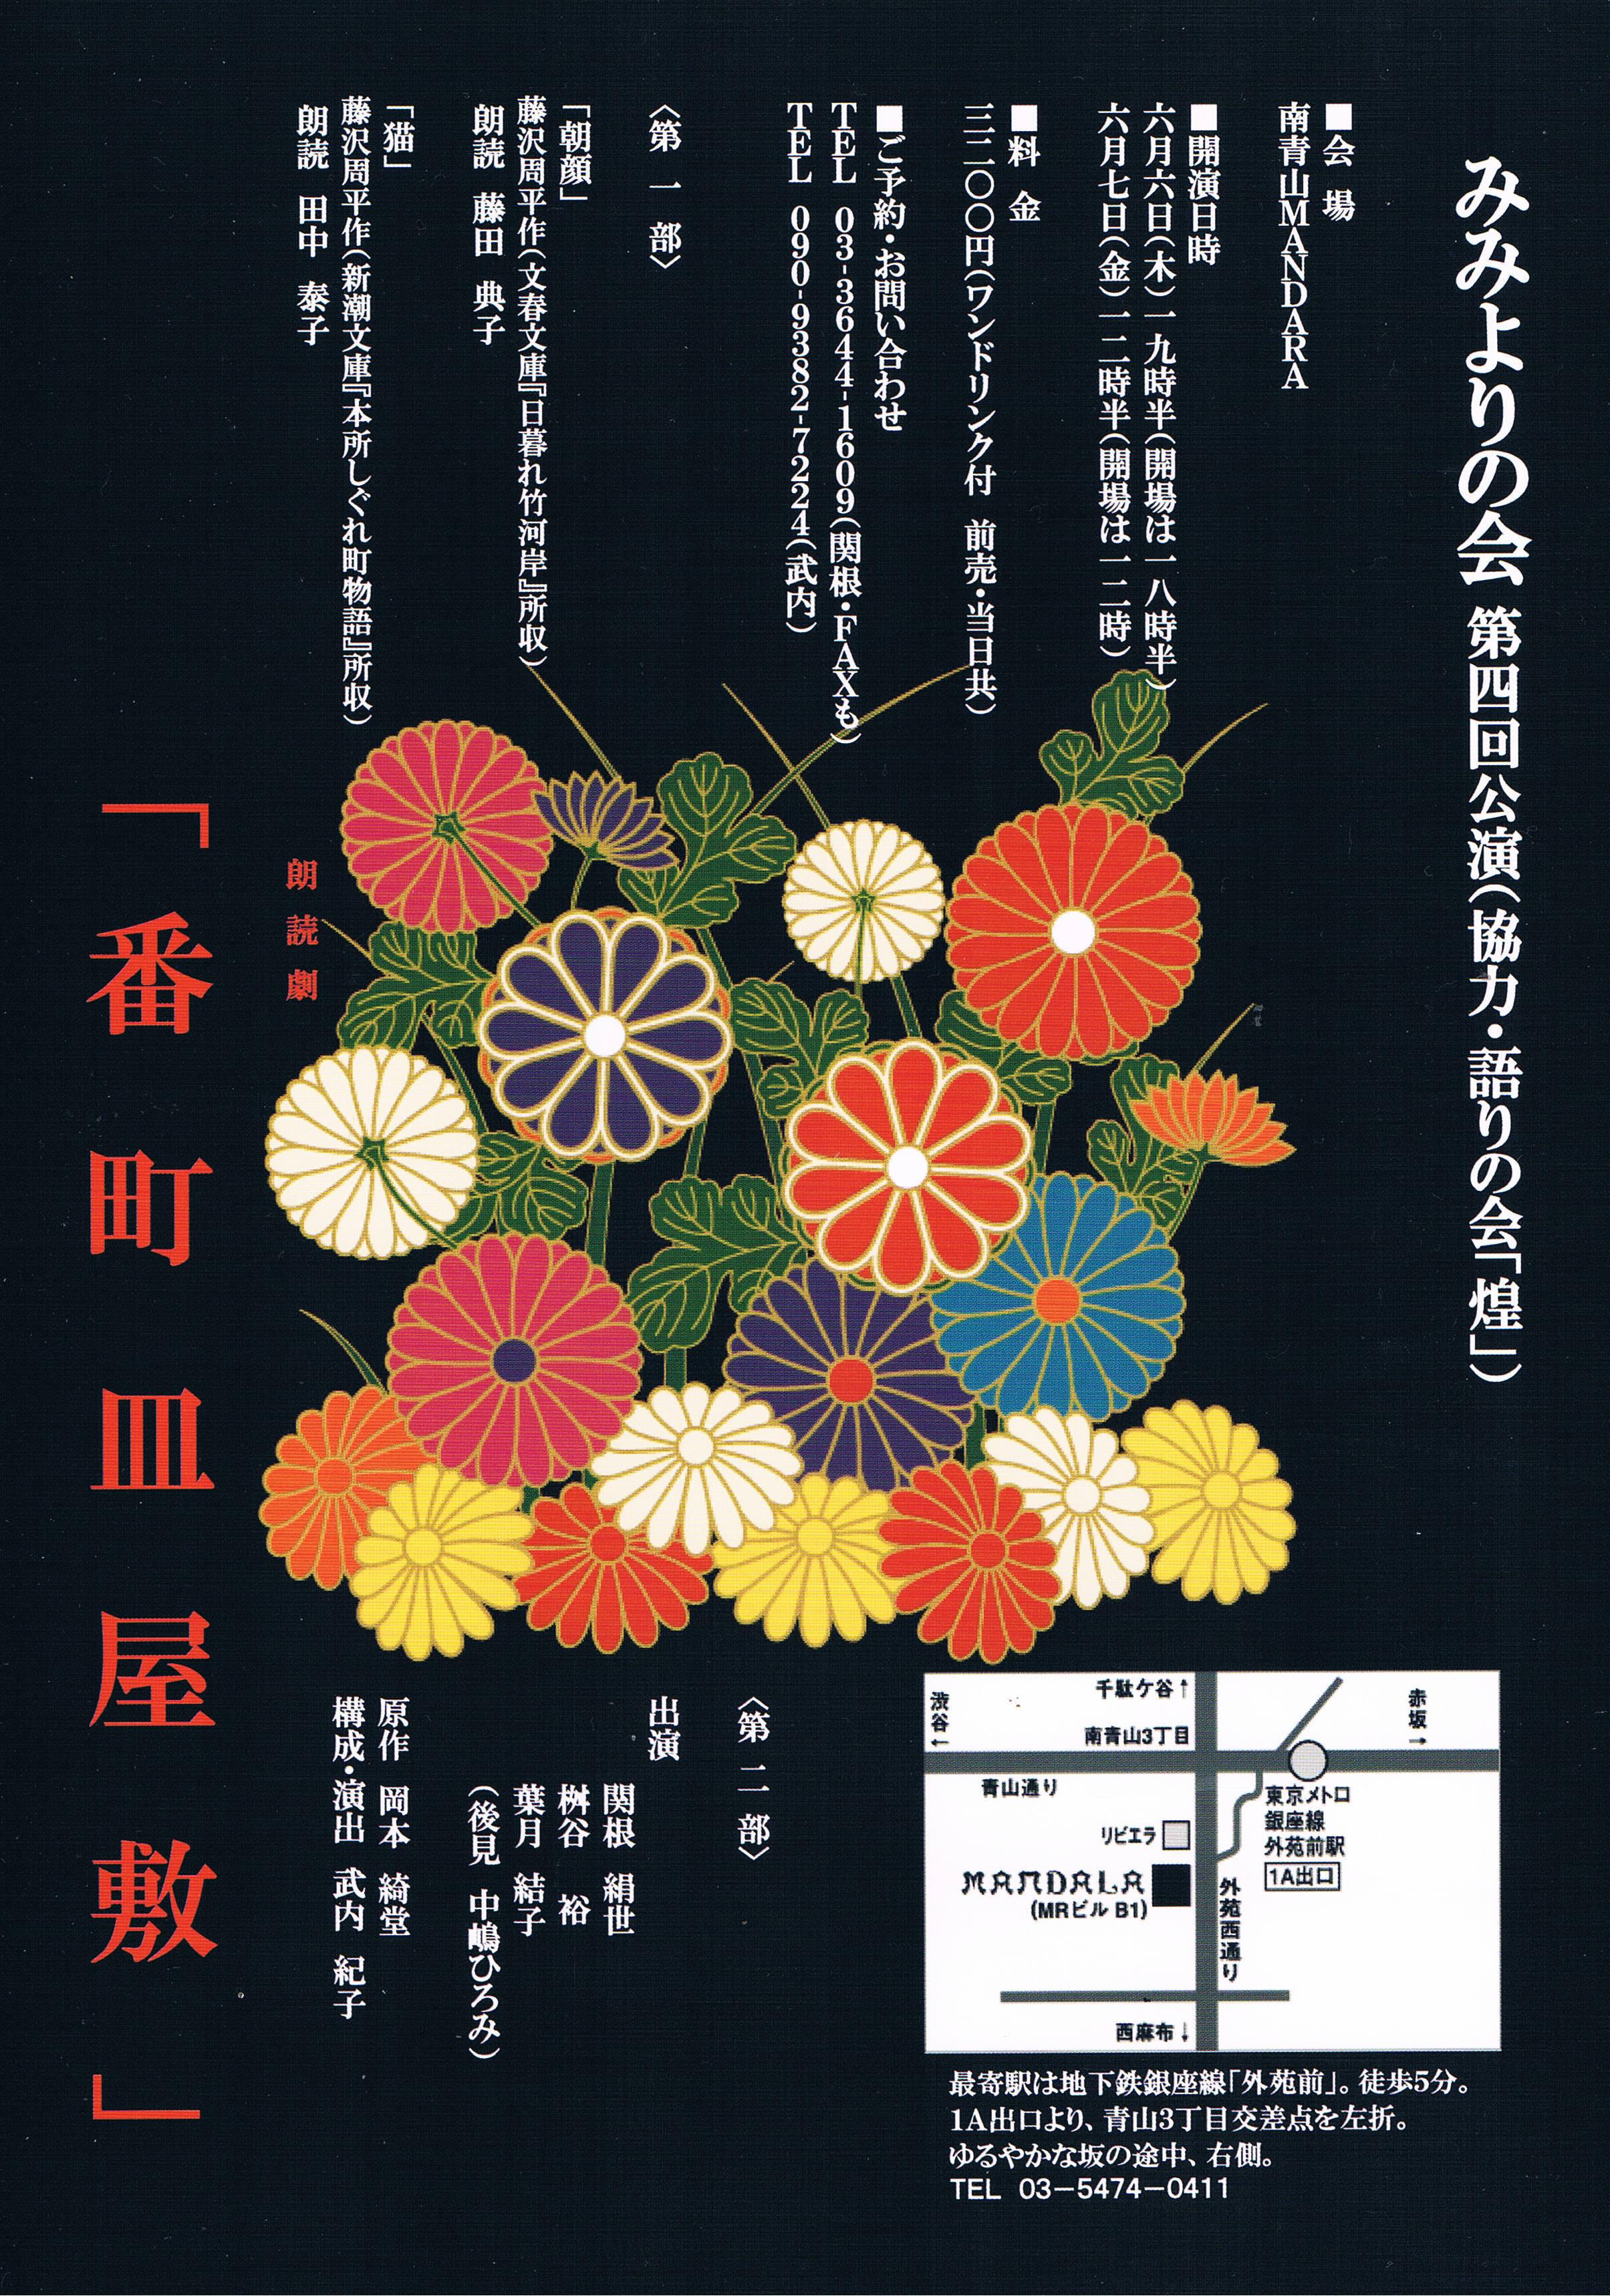 2019june6-7「番町皿屋敷」CCF20190505_00000